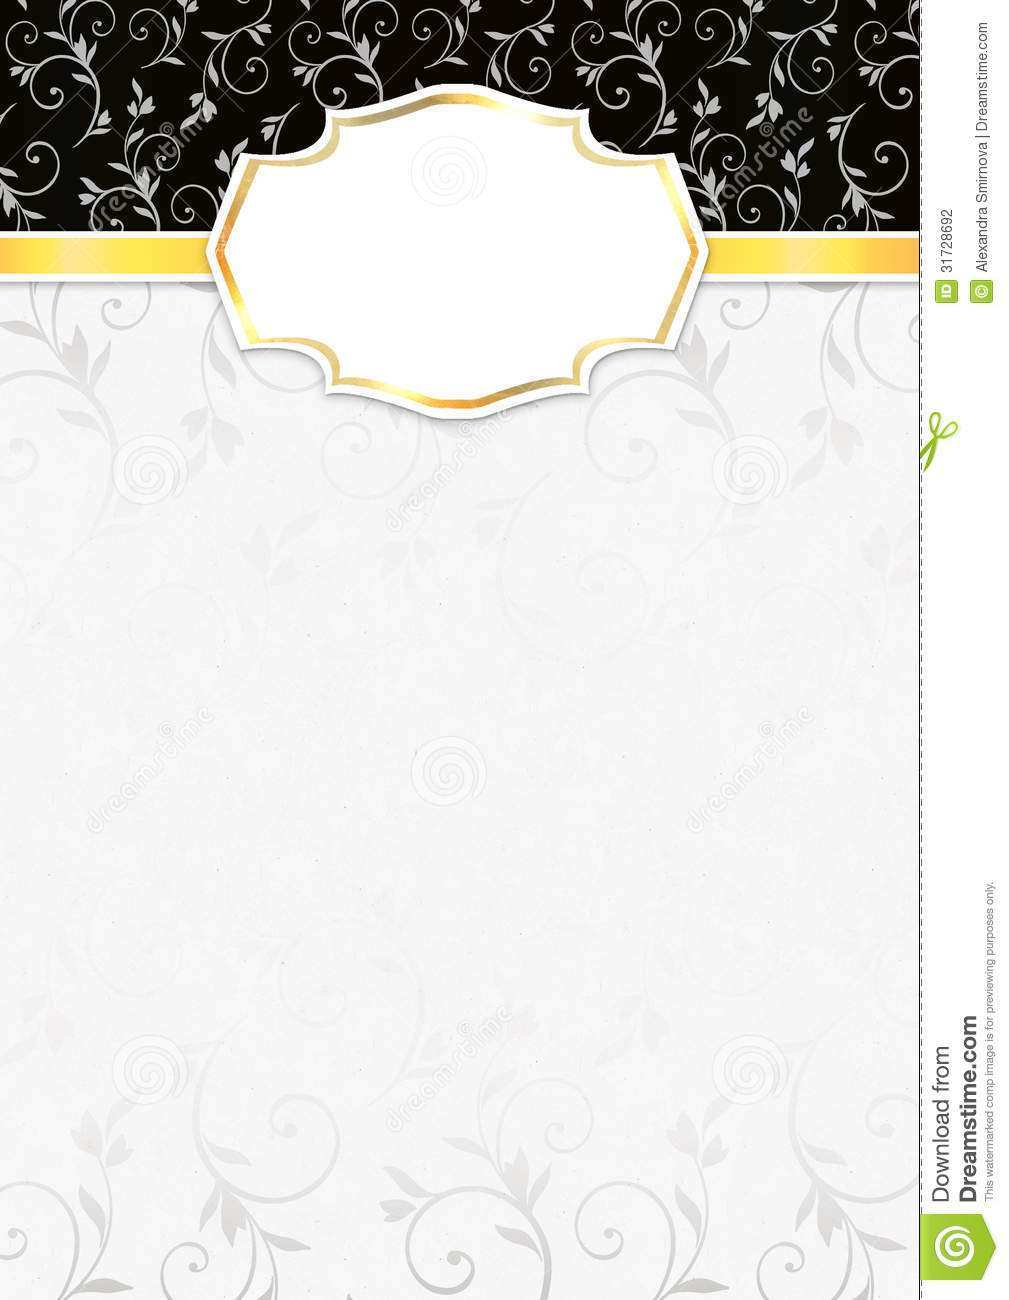 4 Online Elegant Invitation Background Designs Now with Elegant